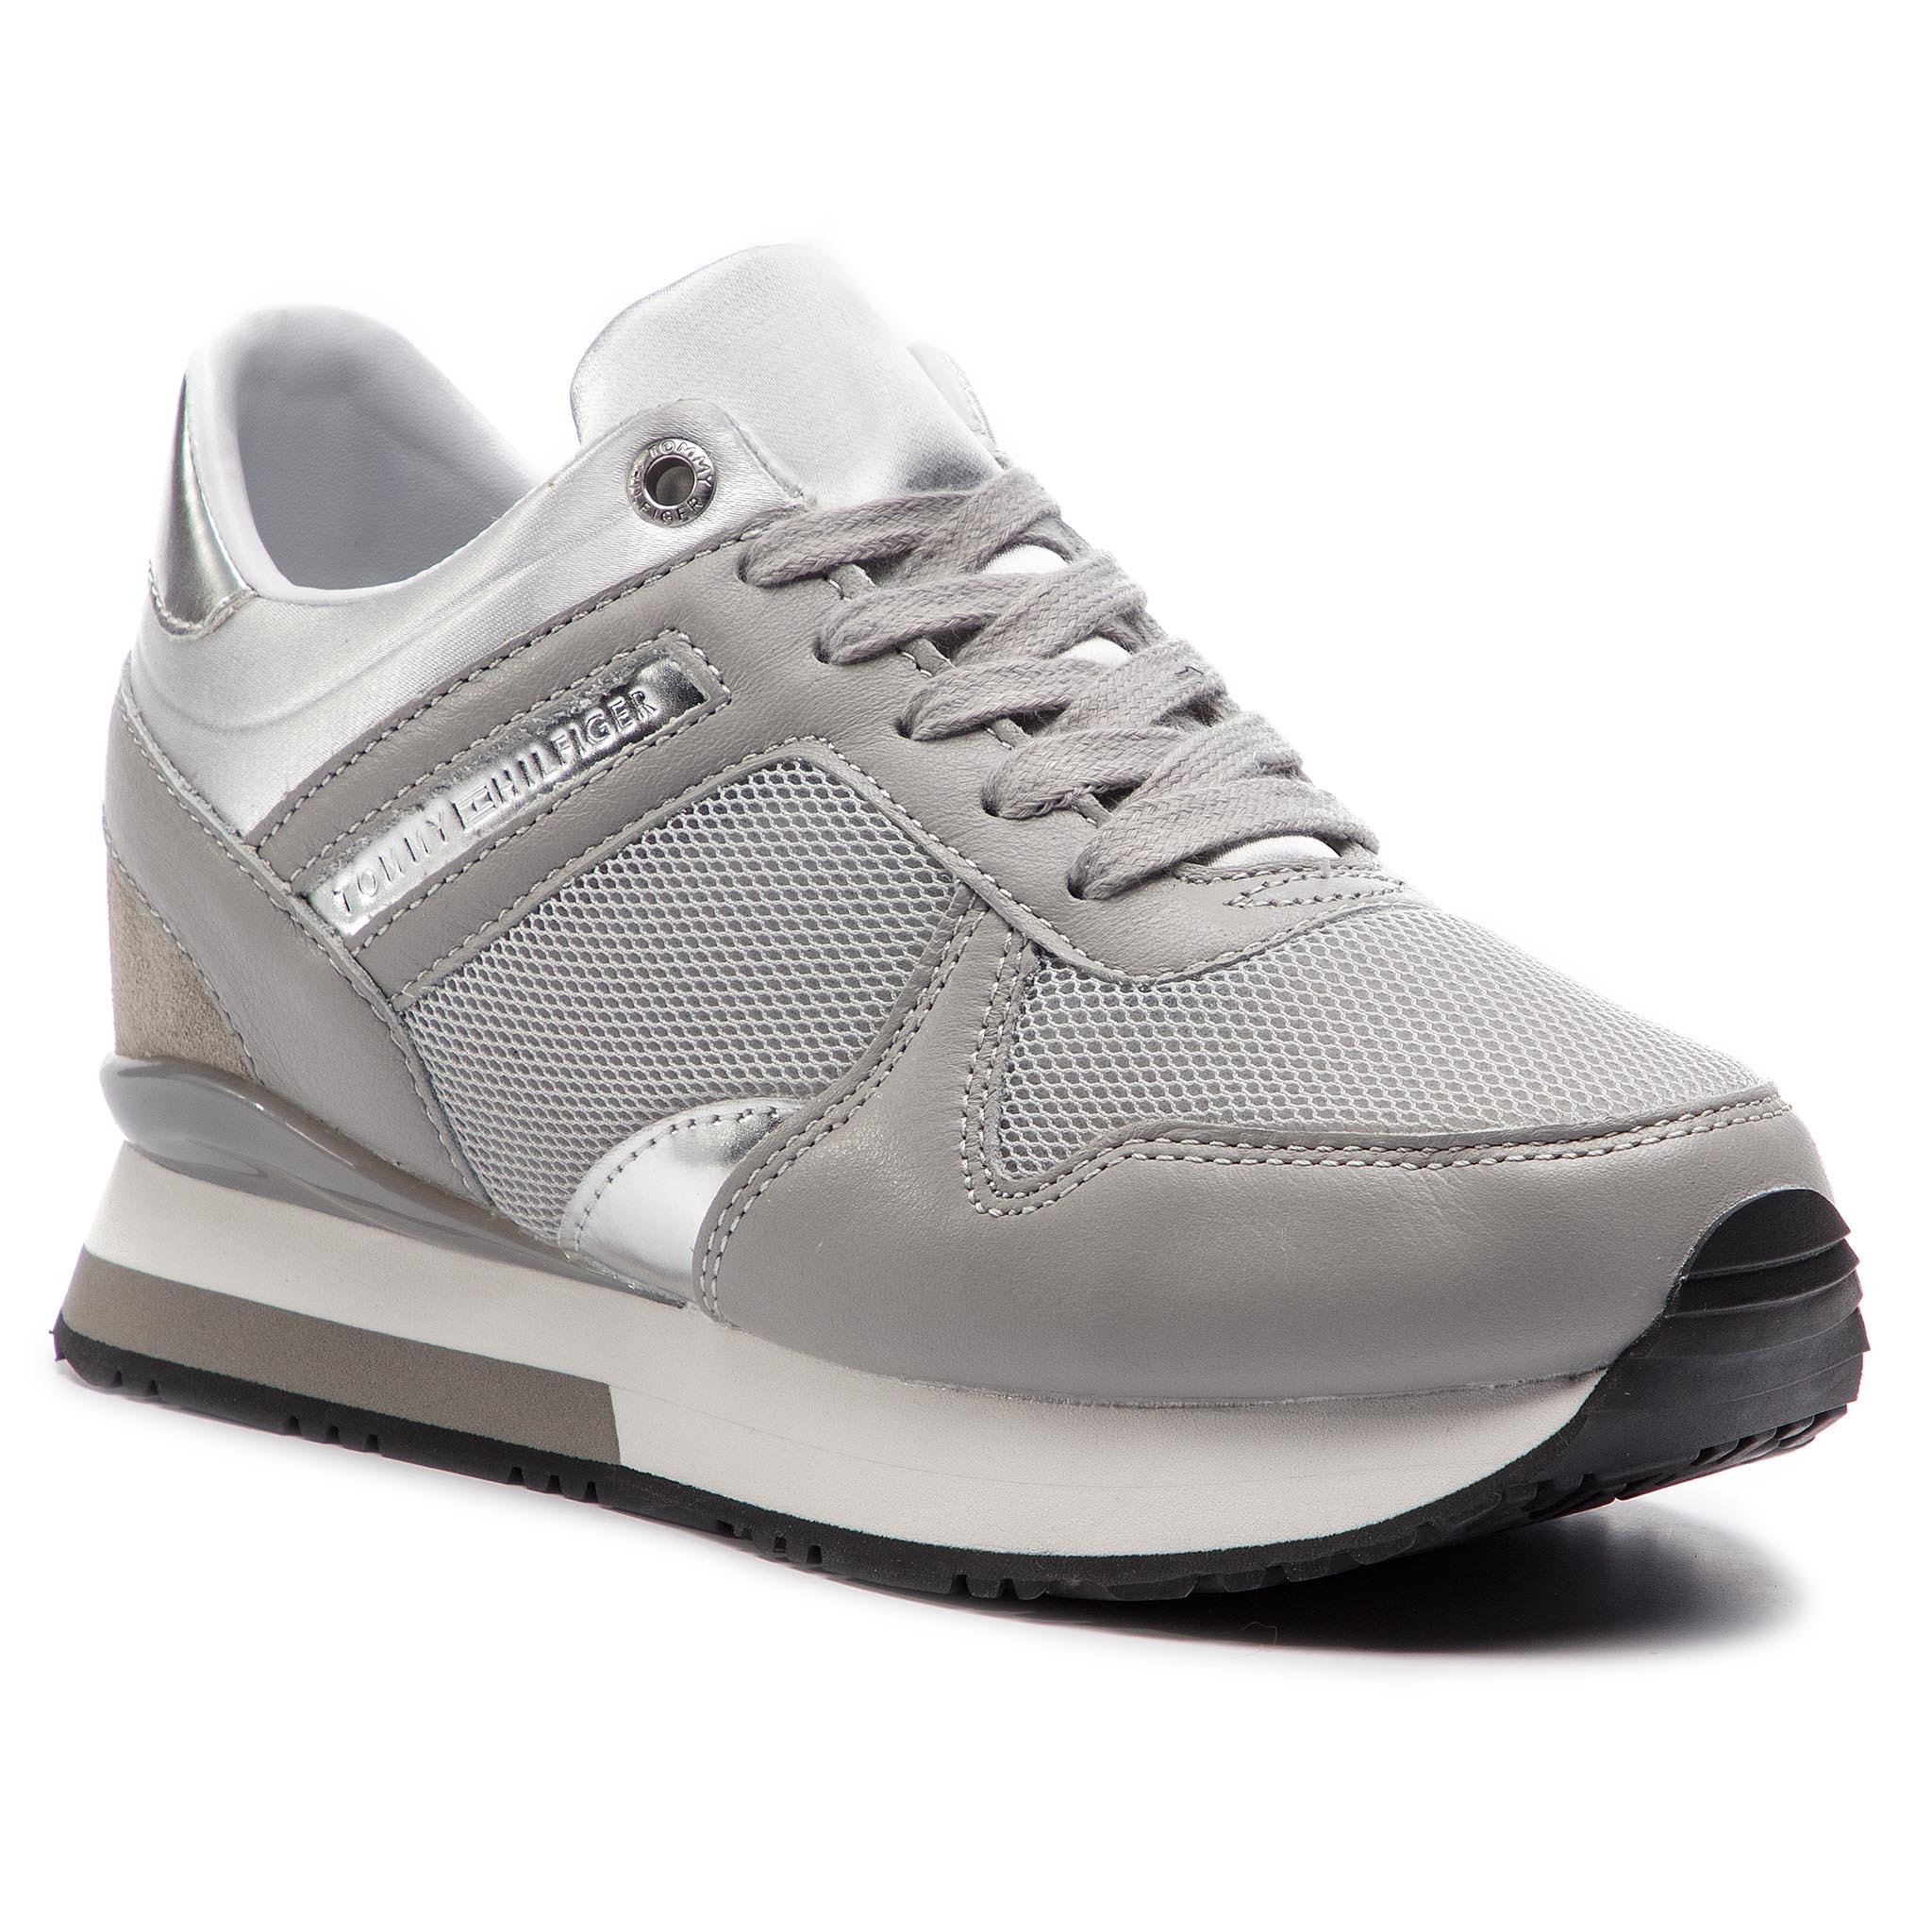 1d88f8c3e3806 Sneakers TOMMY HILFIGER Glitter Textile Wedge Sneaker FW0FW03893 Diamond  Grey 001